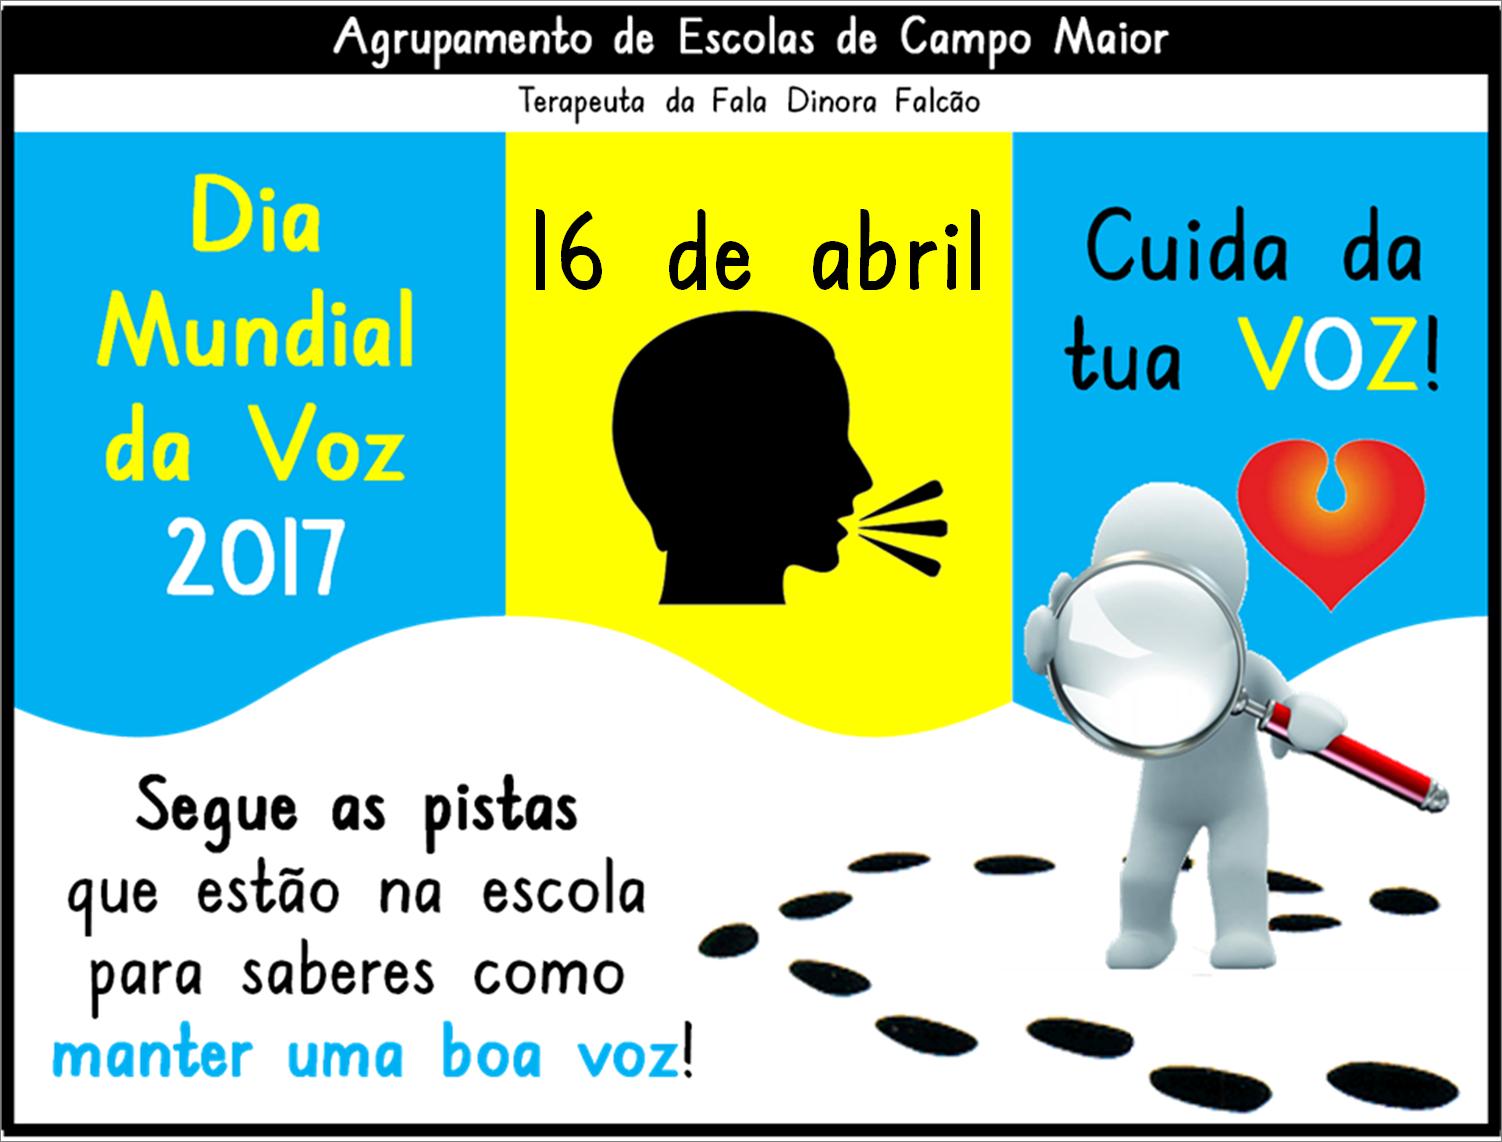 Dia Mundial da Voz 2017